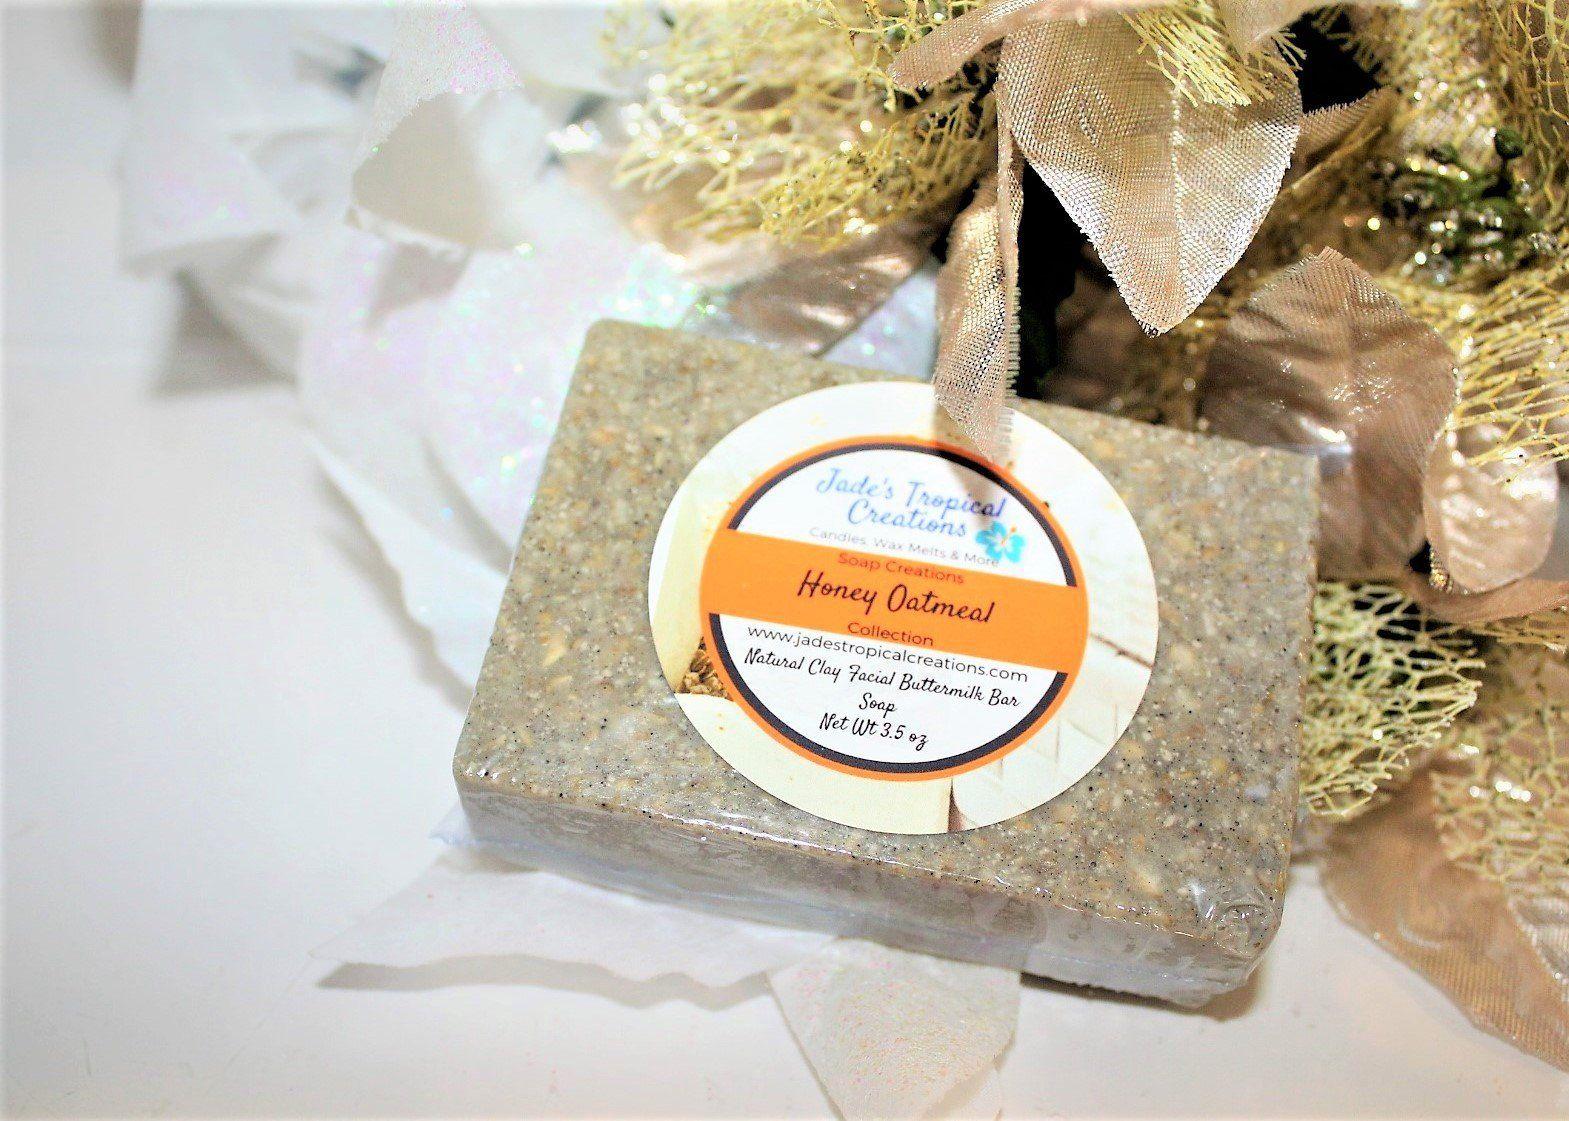 Set of 3 Soaps, Clay Facial Soap, Bentonite Clay Soap